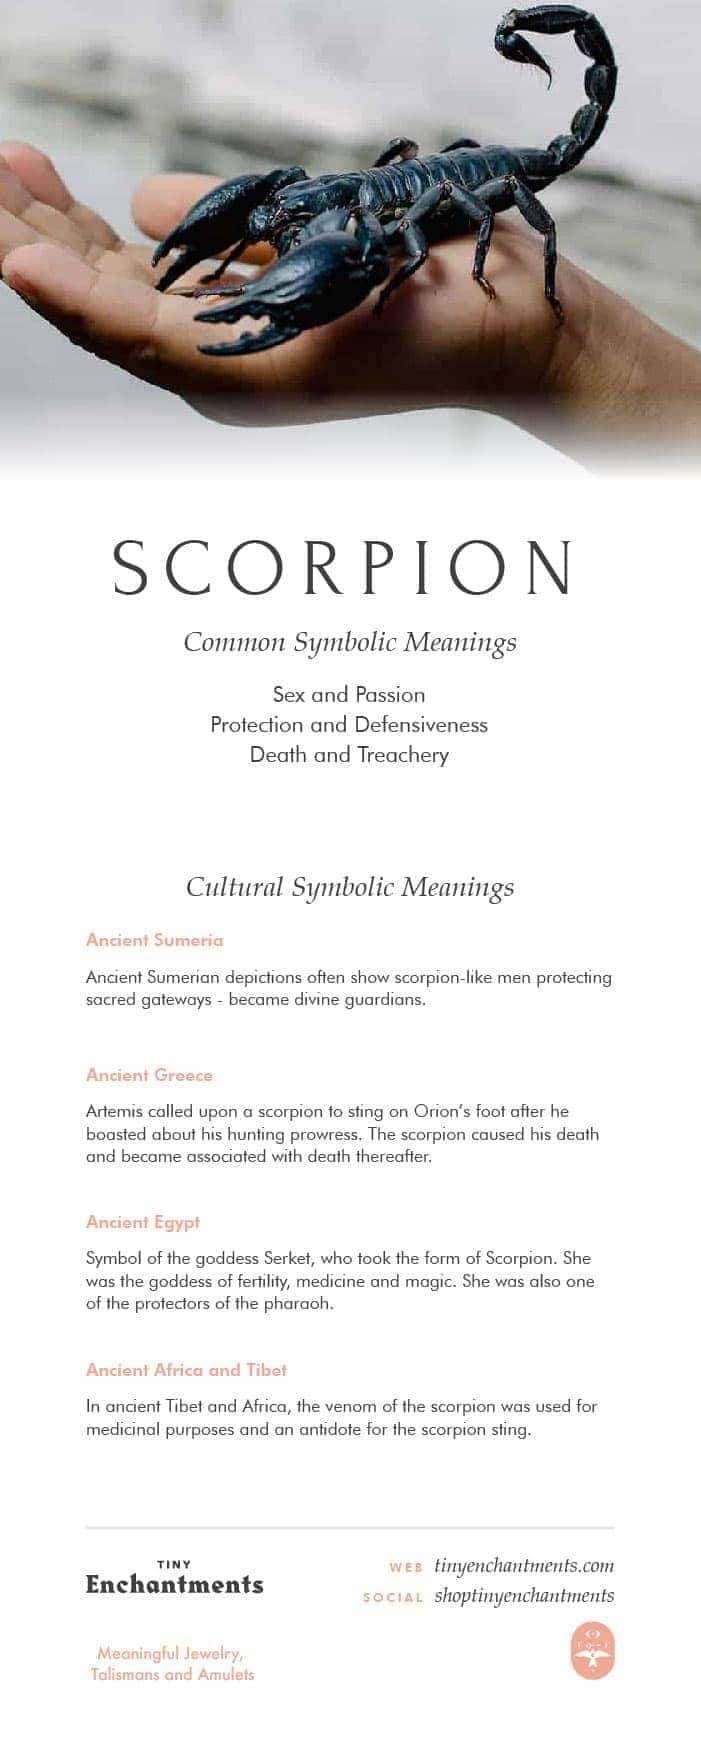 Scorpion Symbolism - Scorpion Dream Meaning, Scorpion Mythology and  Scorpion Spirit Animal Meanings Full Infographic: spirit animal, animal  guide, ...